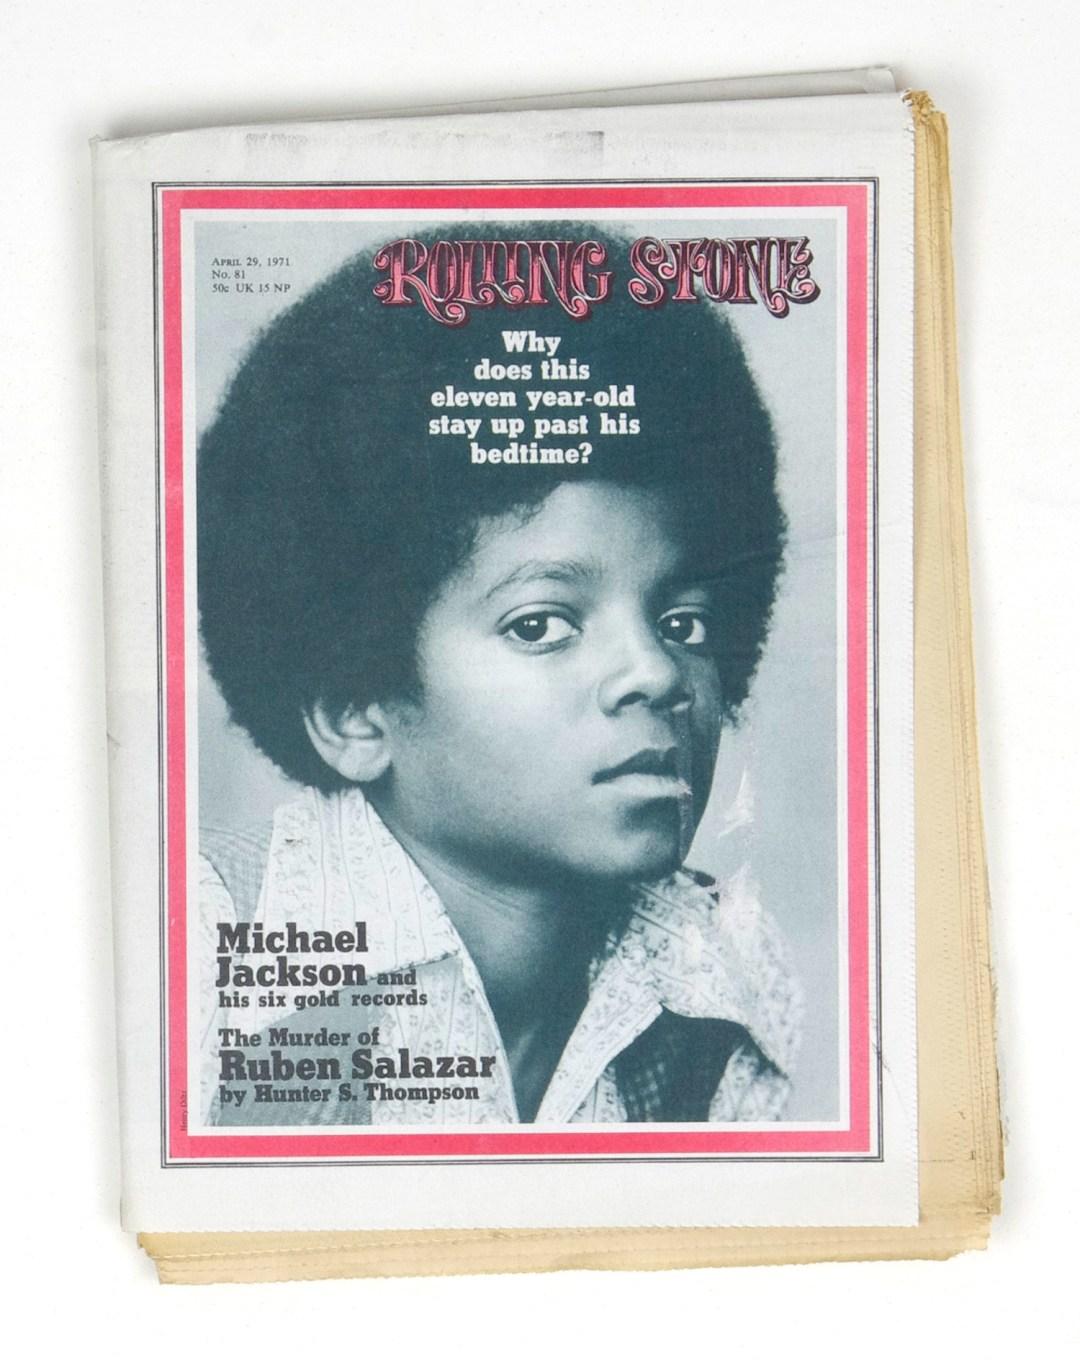 Rolling Stone Magazine 1971 Apr 29 No. 81 Michael Jackson